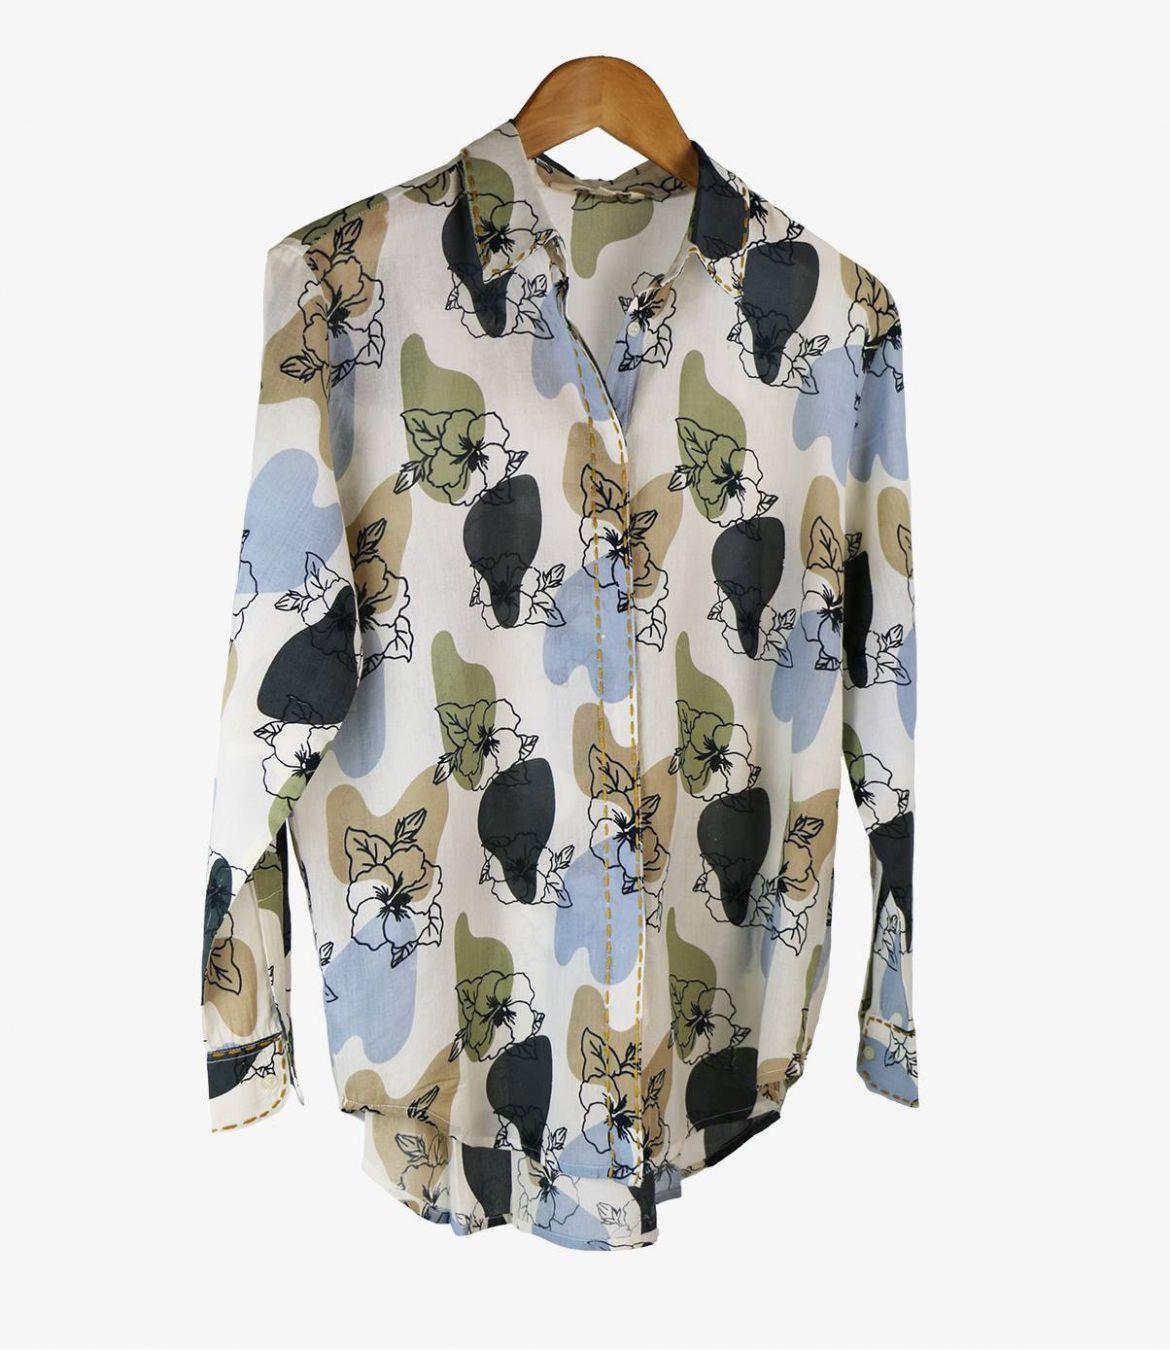 CARI VANYA Cotton Shirt for Women Storiatipic - 1